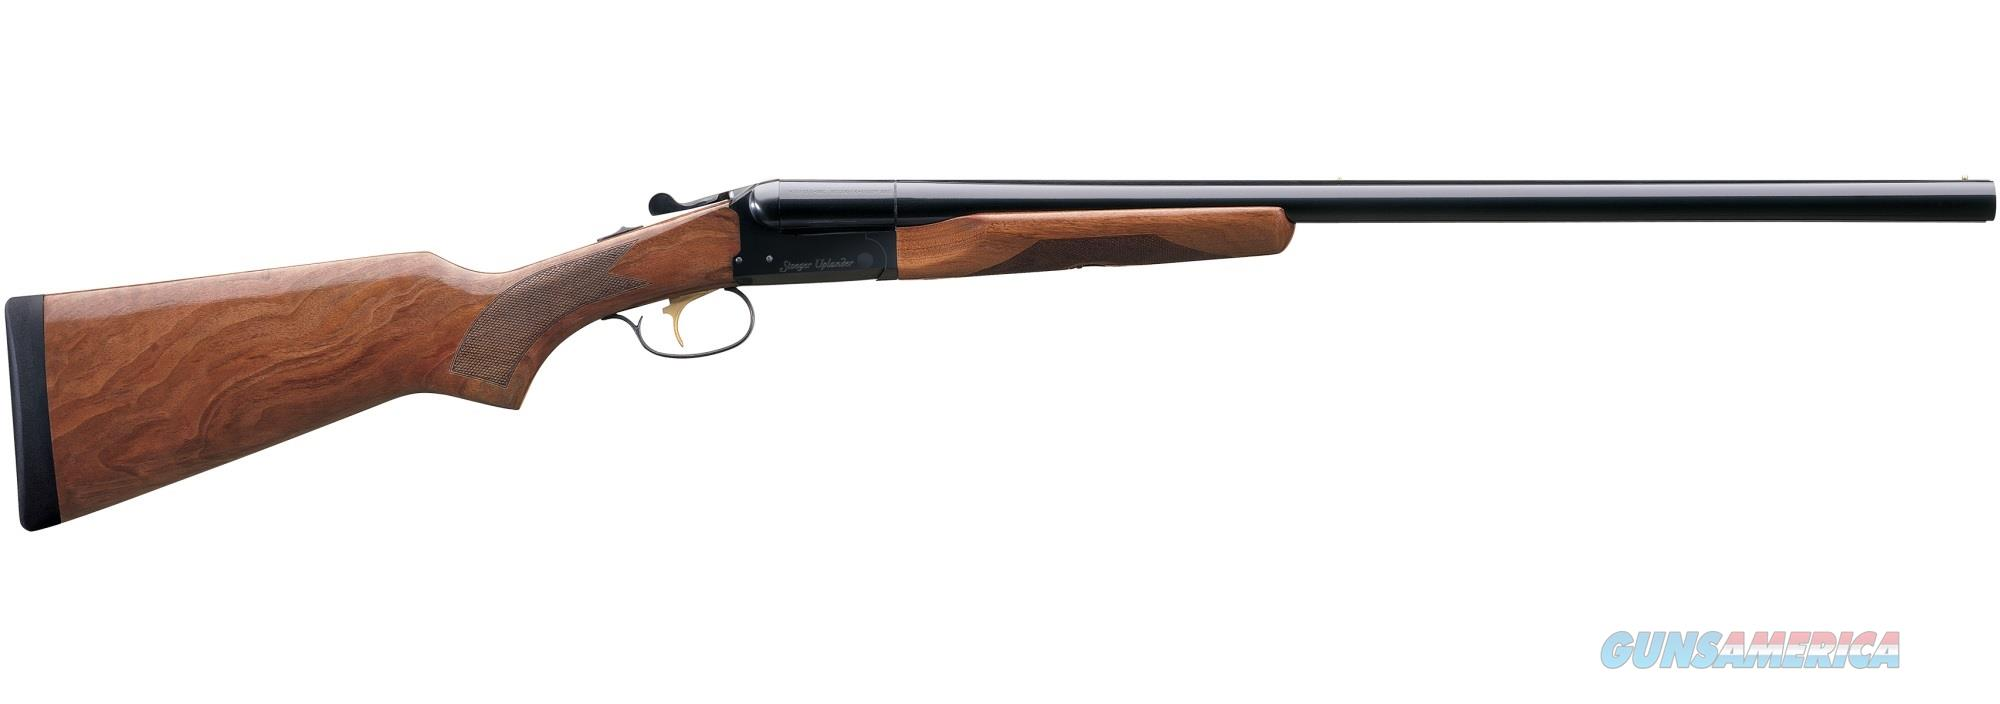 "Stoeger Uplander Supreme SxS 12 Gauge 26"" 31100   Guns > Shotguns > Stoeger Shotguns"